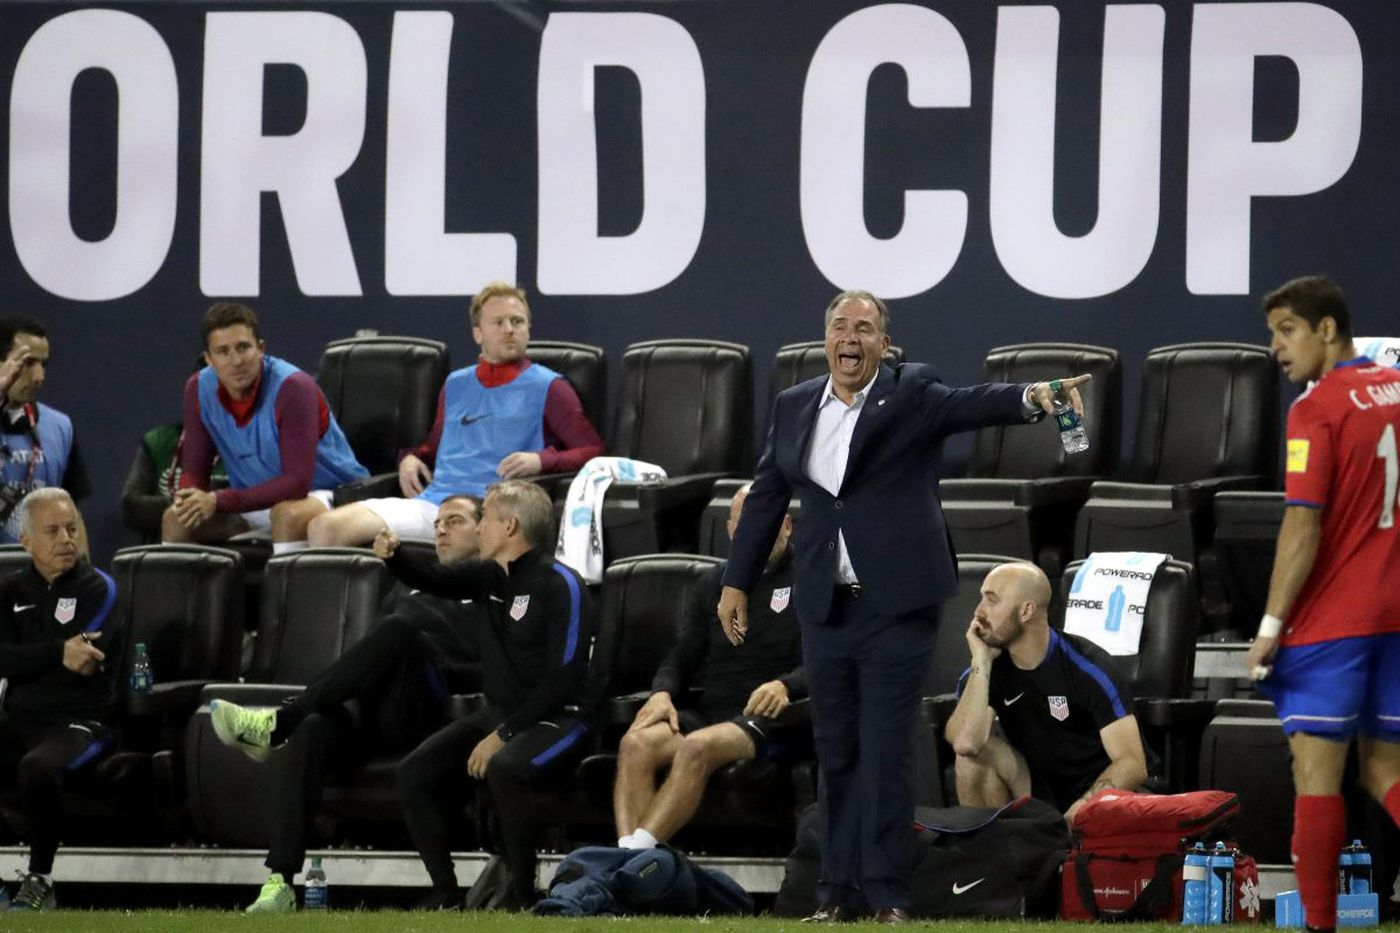 U.S. men's soccer team heads to Honduras feeling some self-inflicted pressure